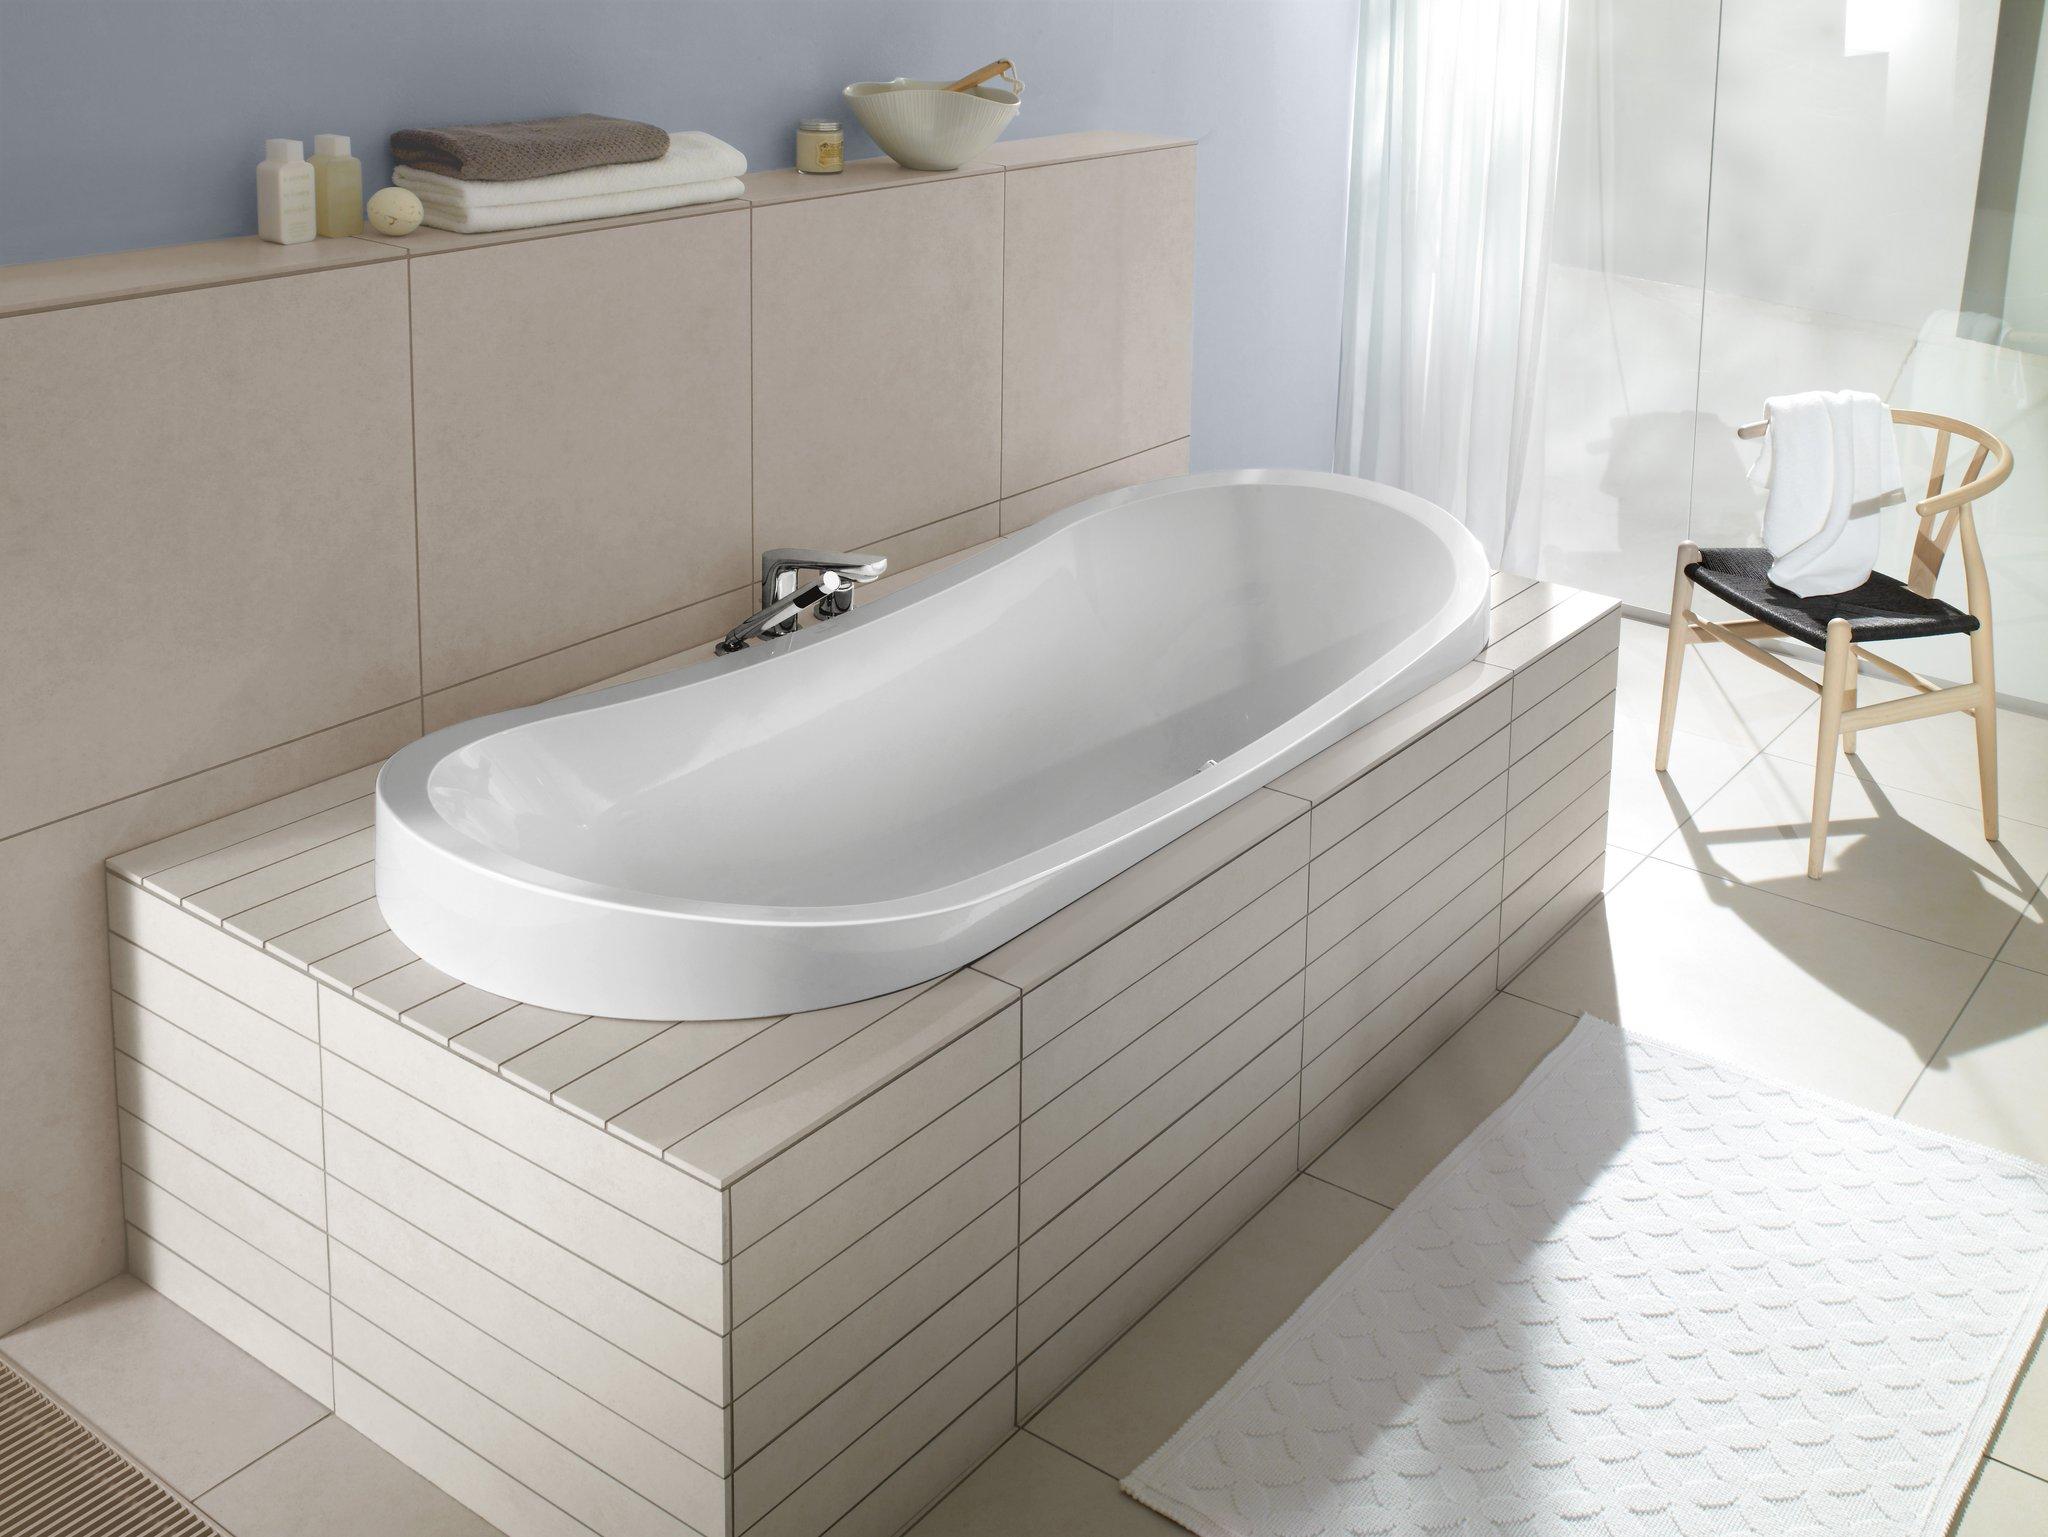 Taille de bain standard